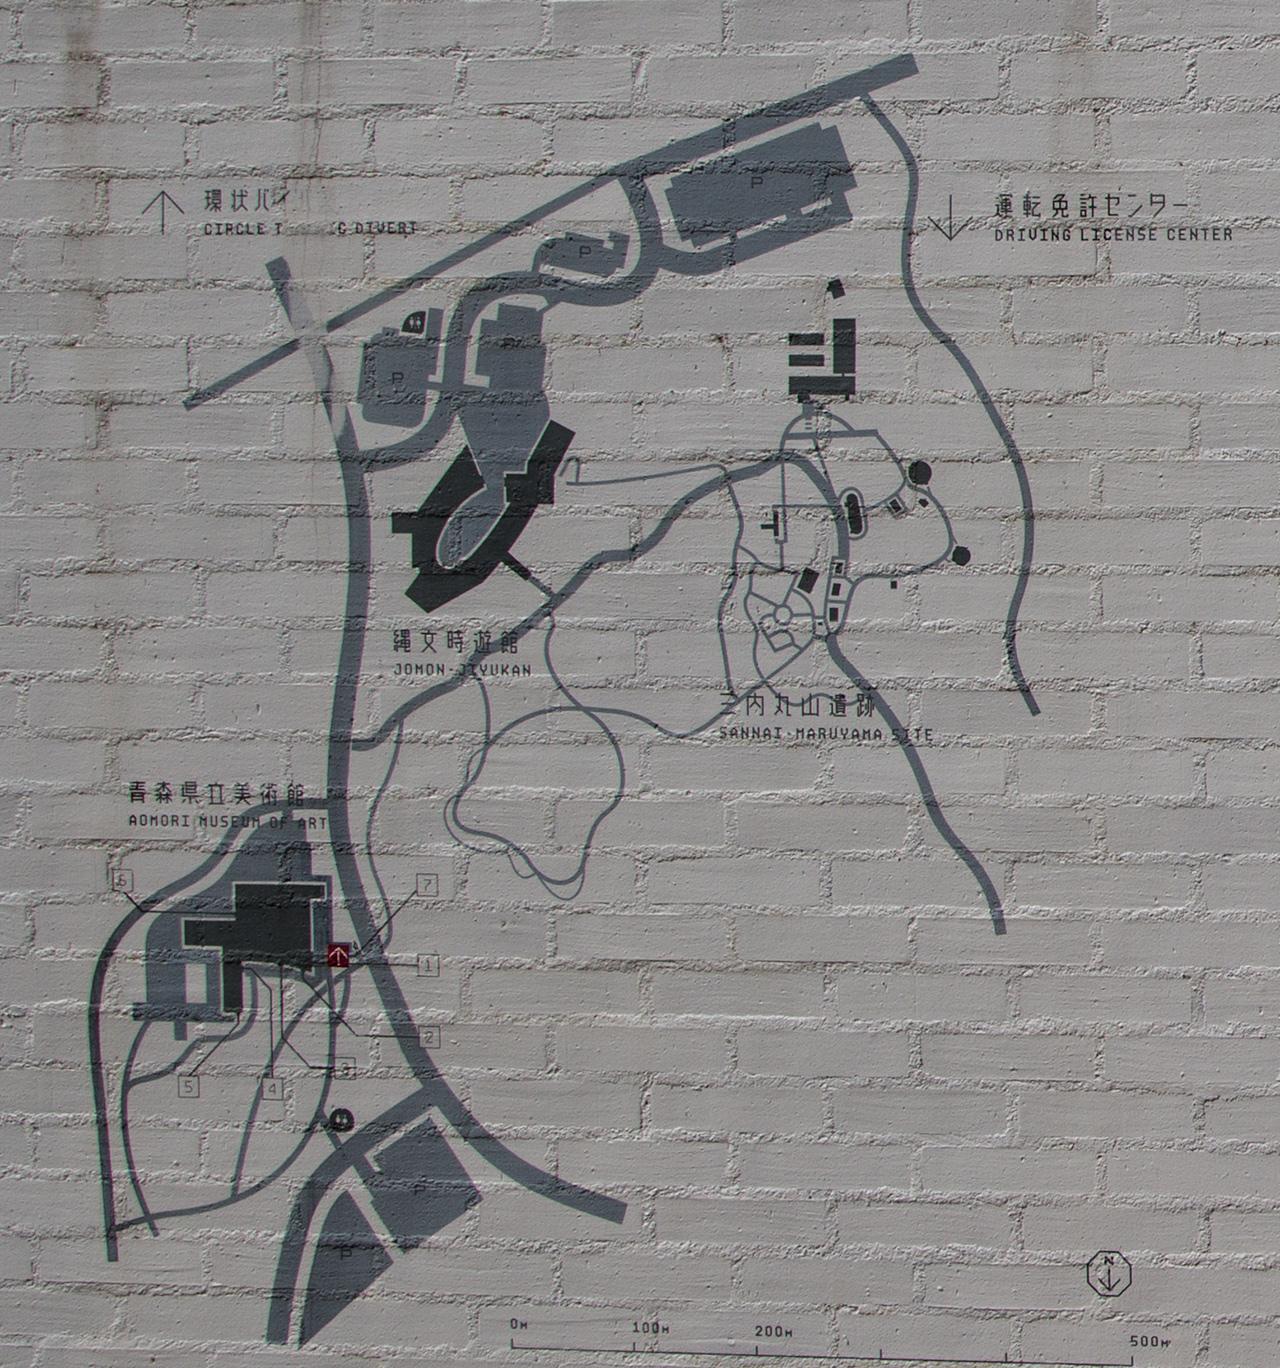 aomori museum map